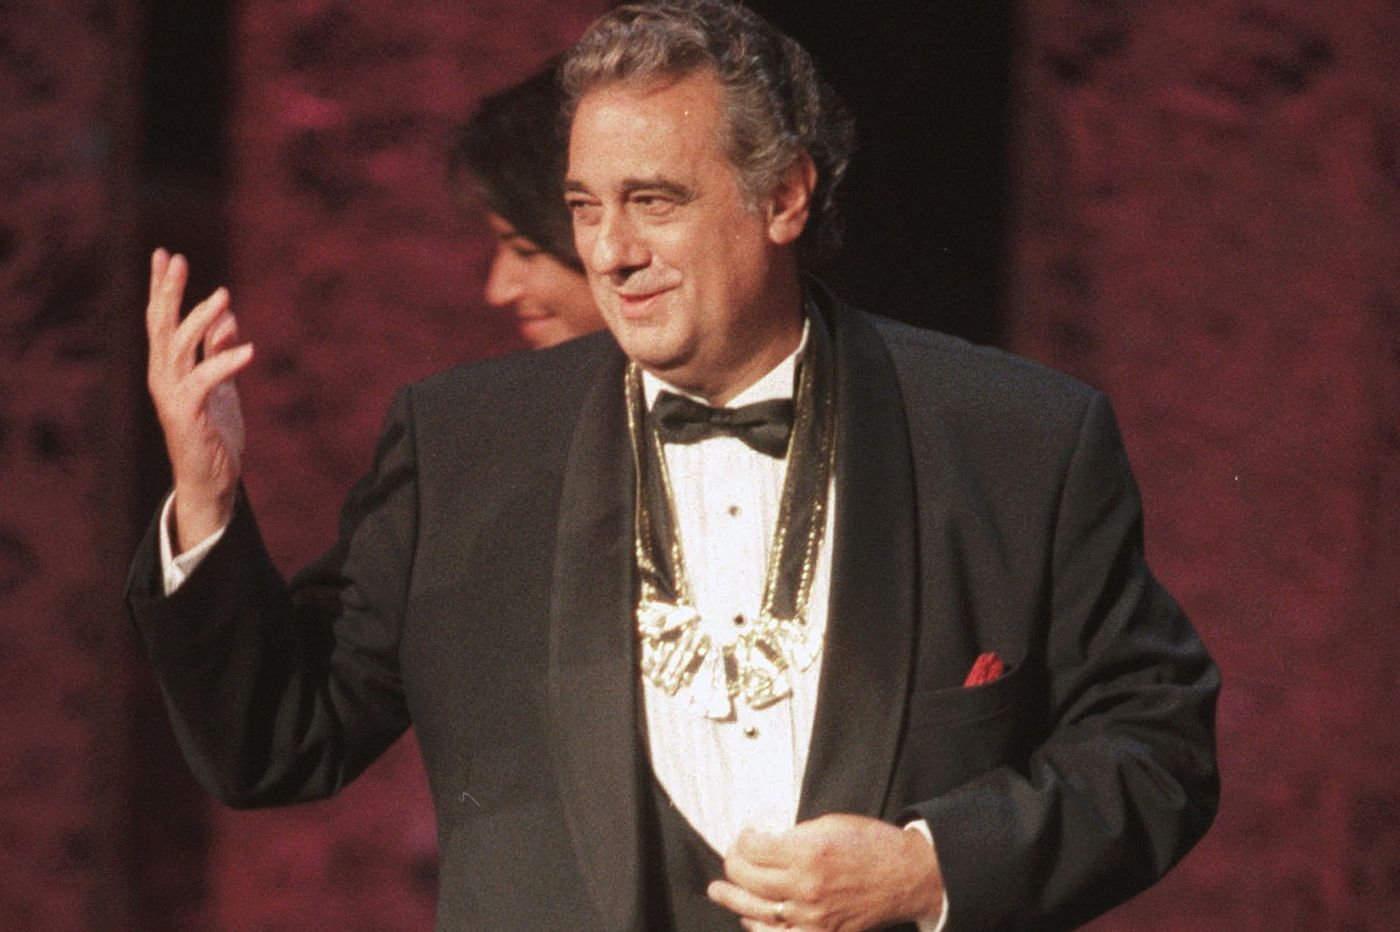 New women accuse opera legend Plácido Domingo of sexual harassment